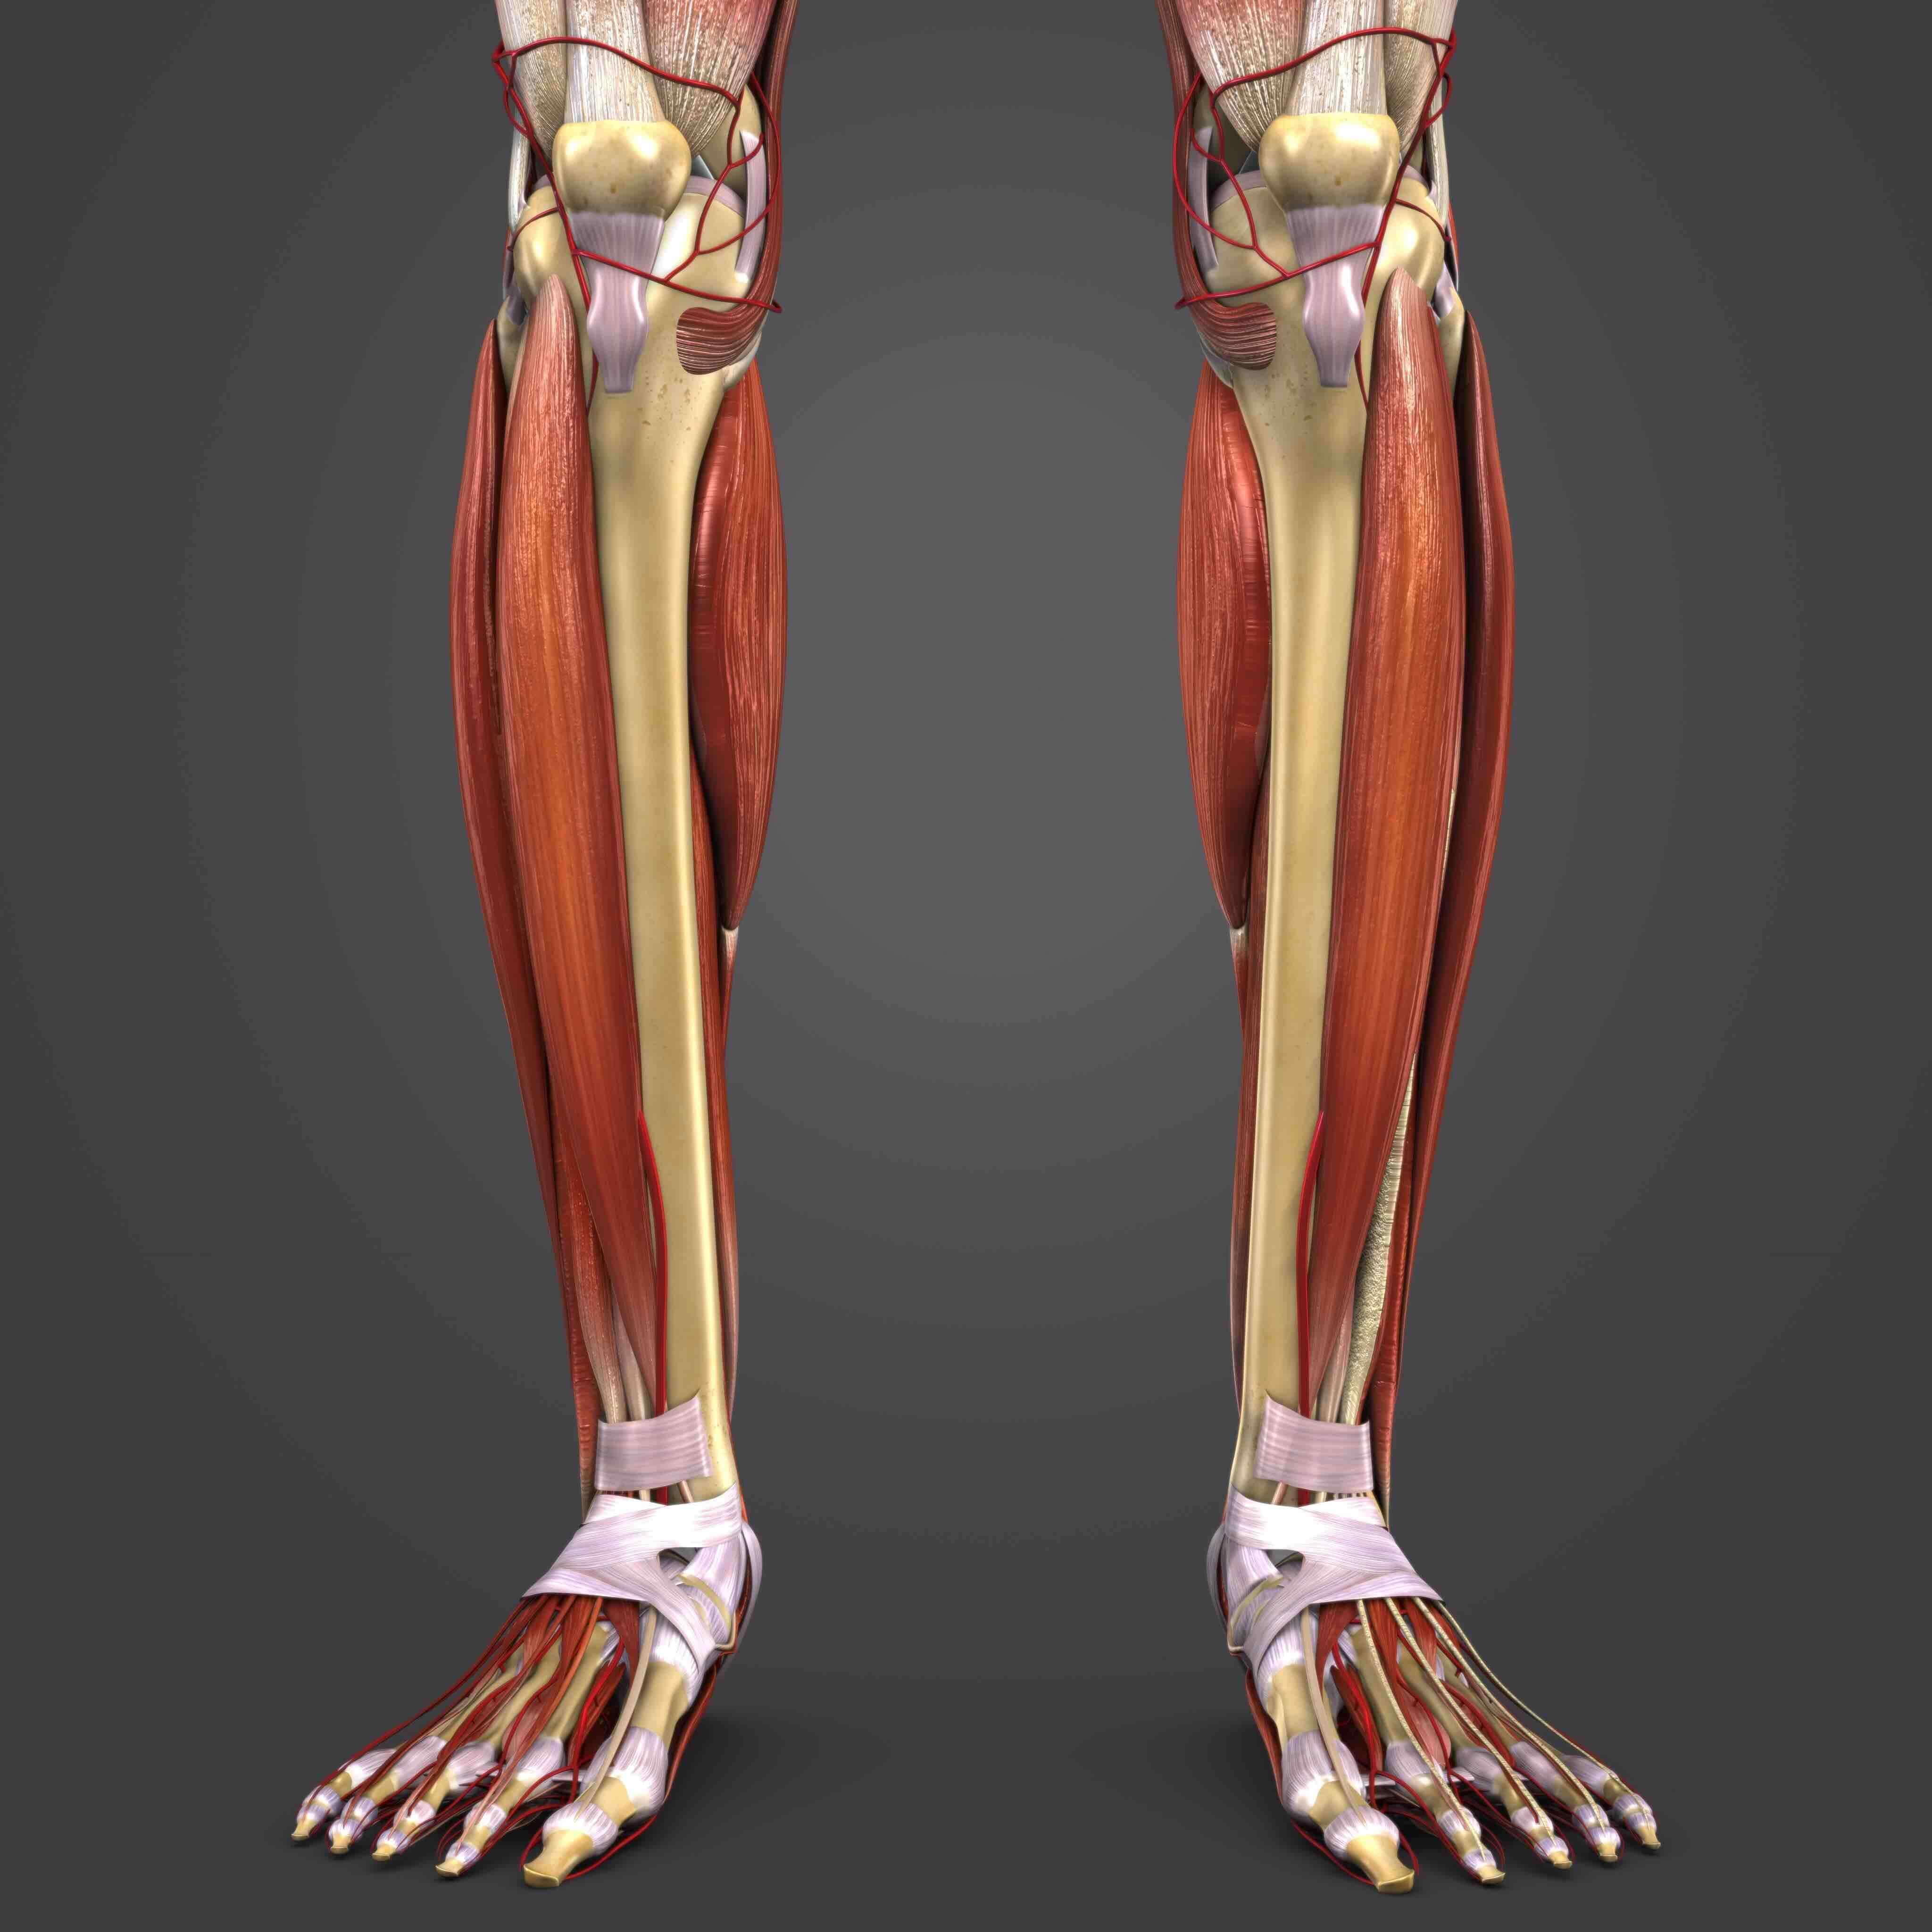 Shin Splints Medial Tibial Stress Syndrome Aoa Orthopedic Specialist